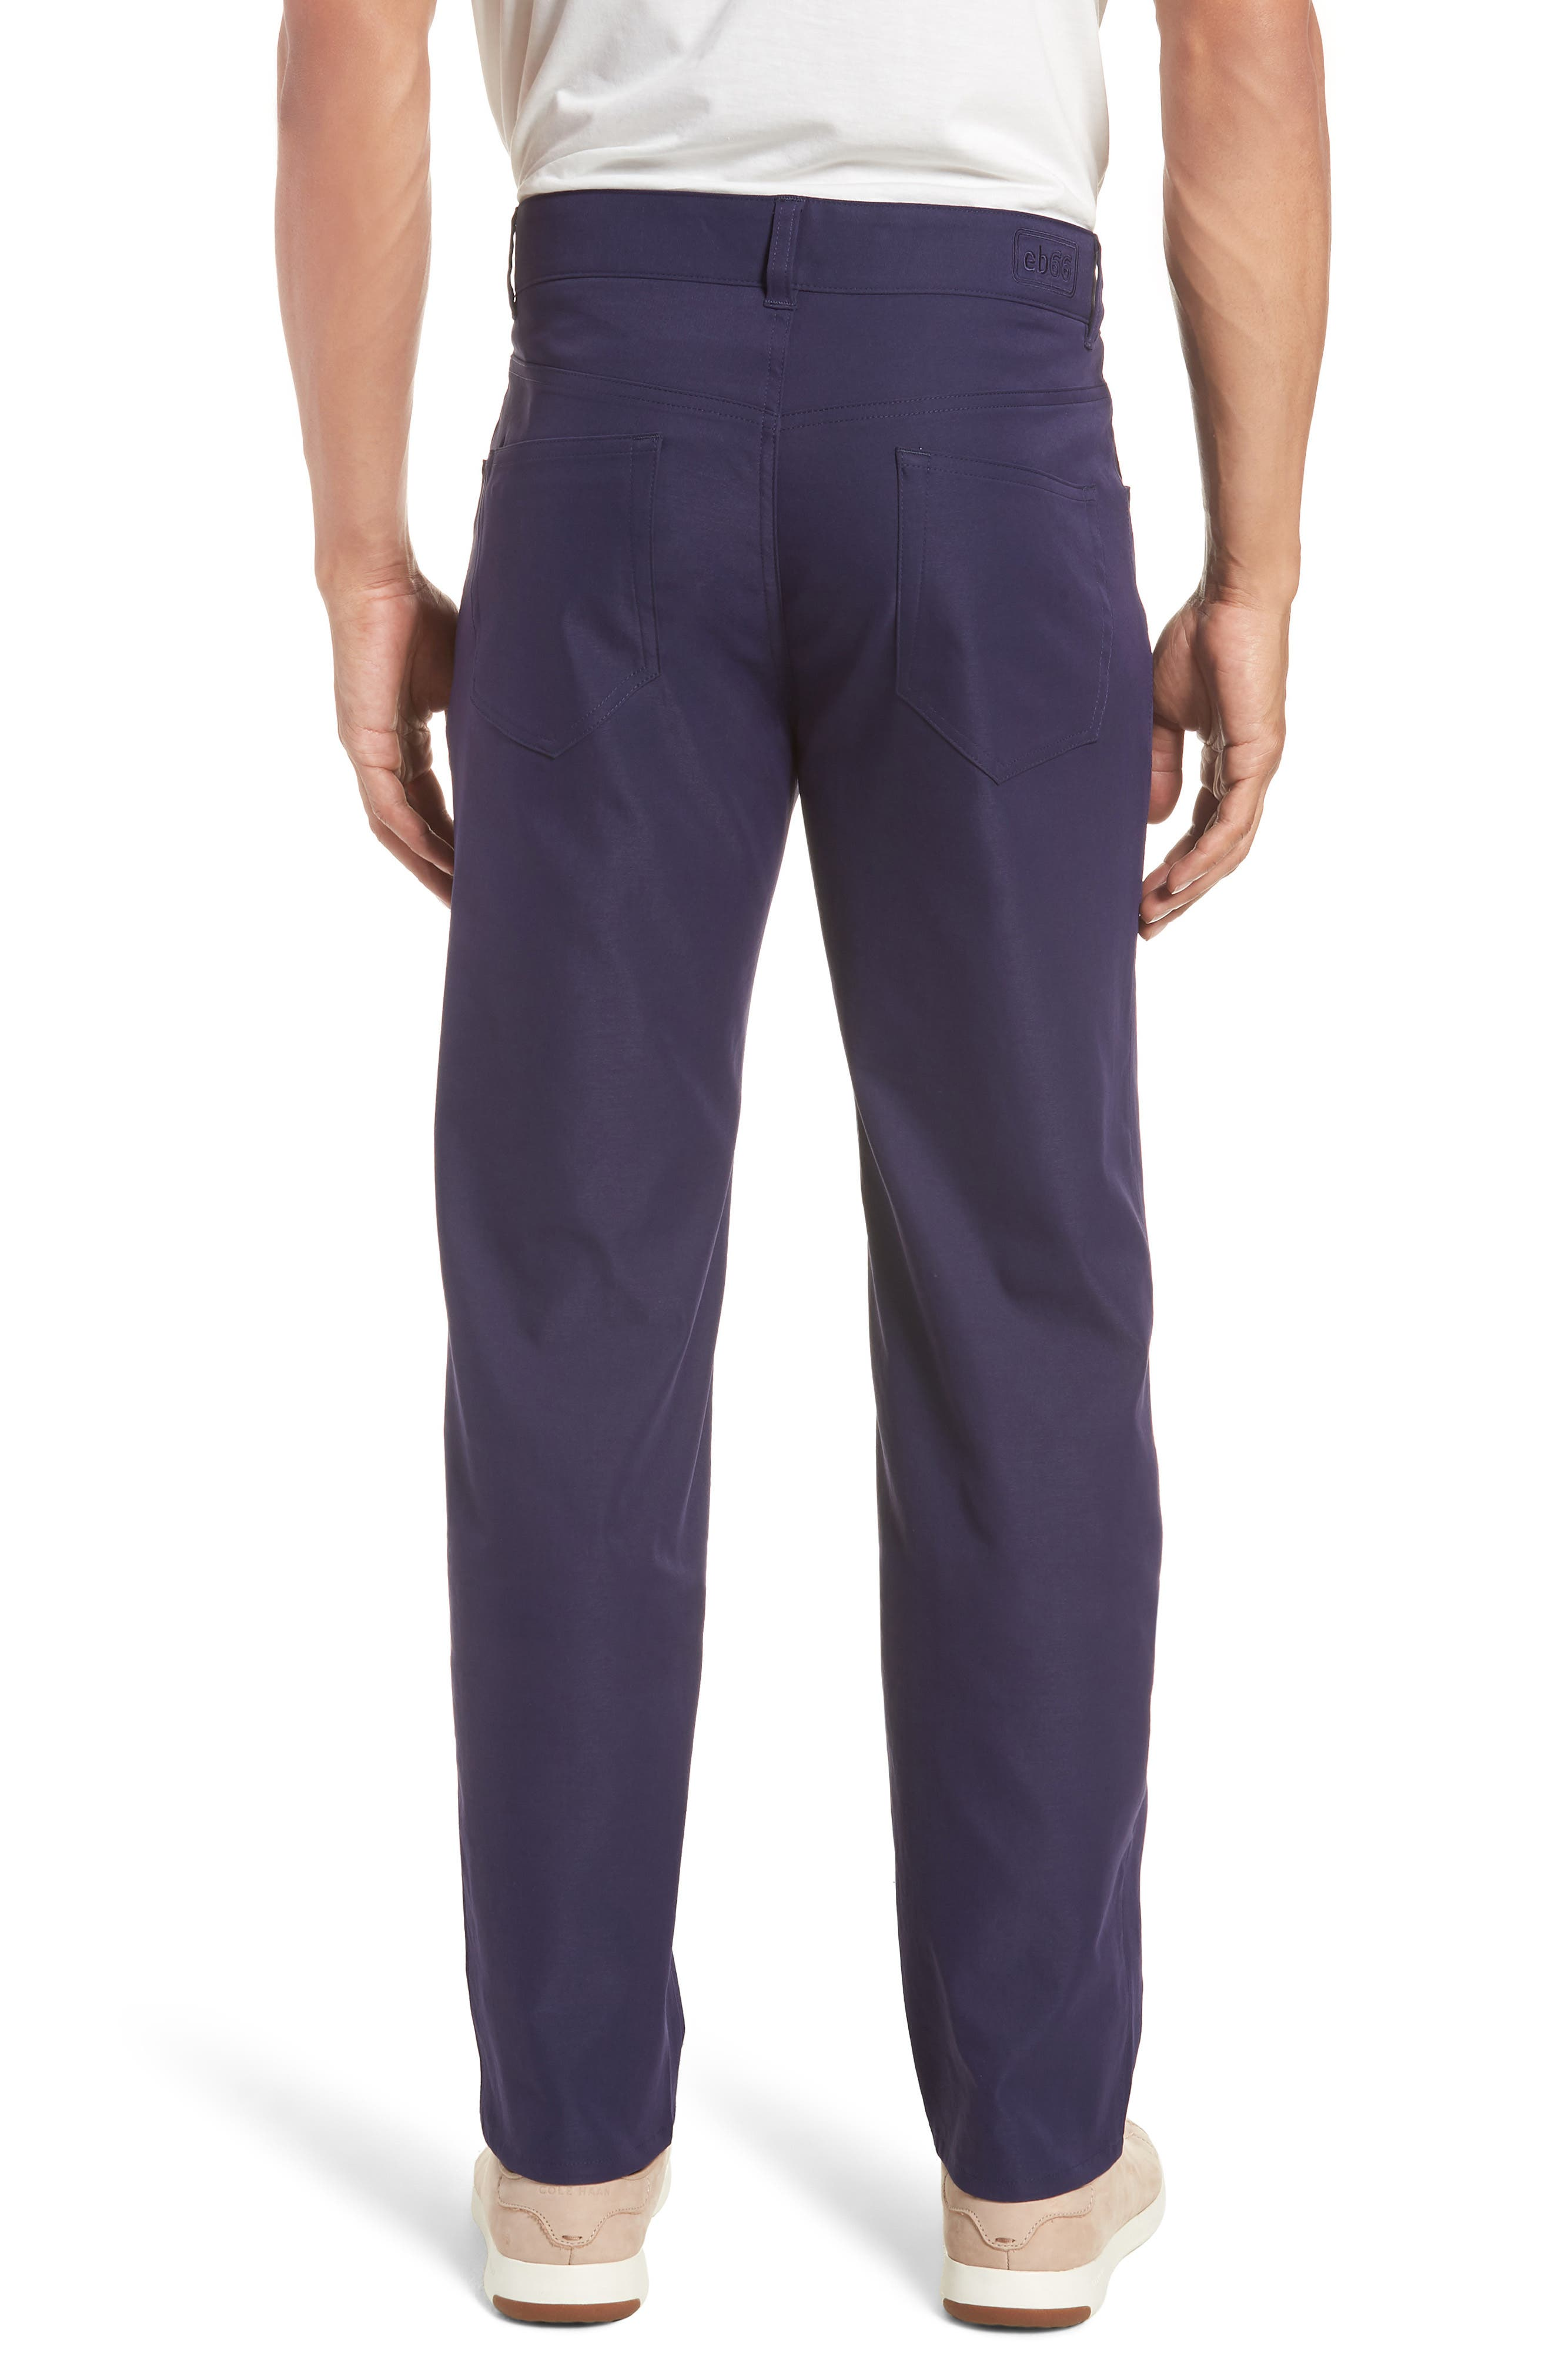 EB66 Performance Six-Pocket Pants,                             Alternate thumbnail 11, color,